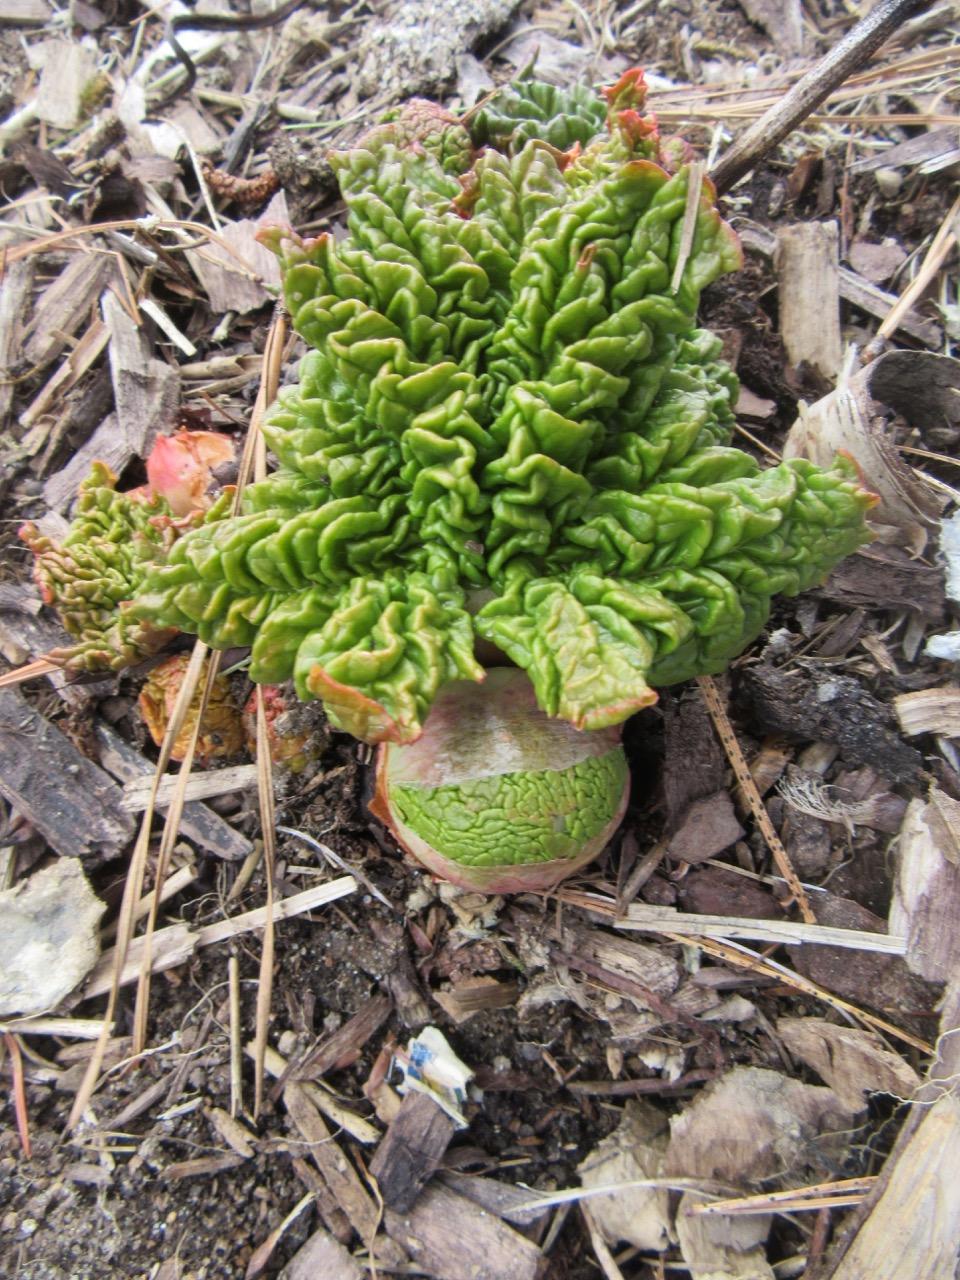 Rhubarb opening